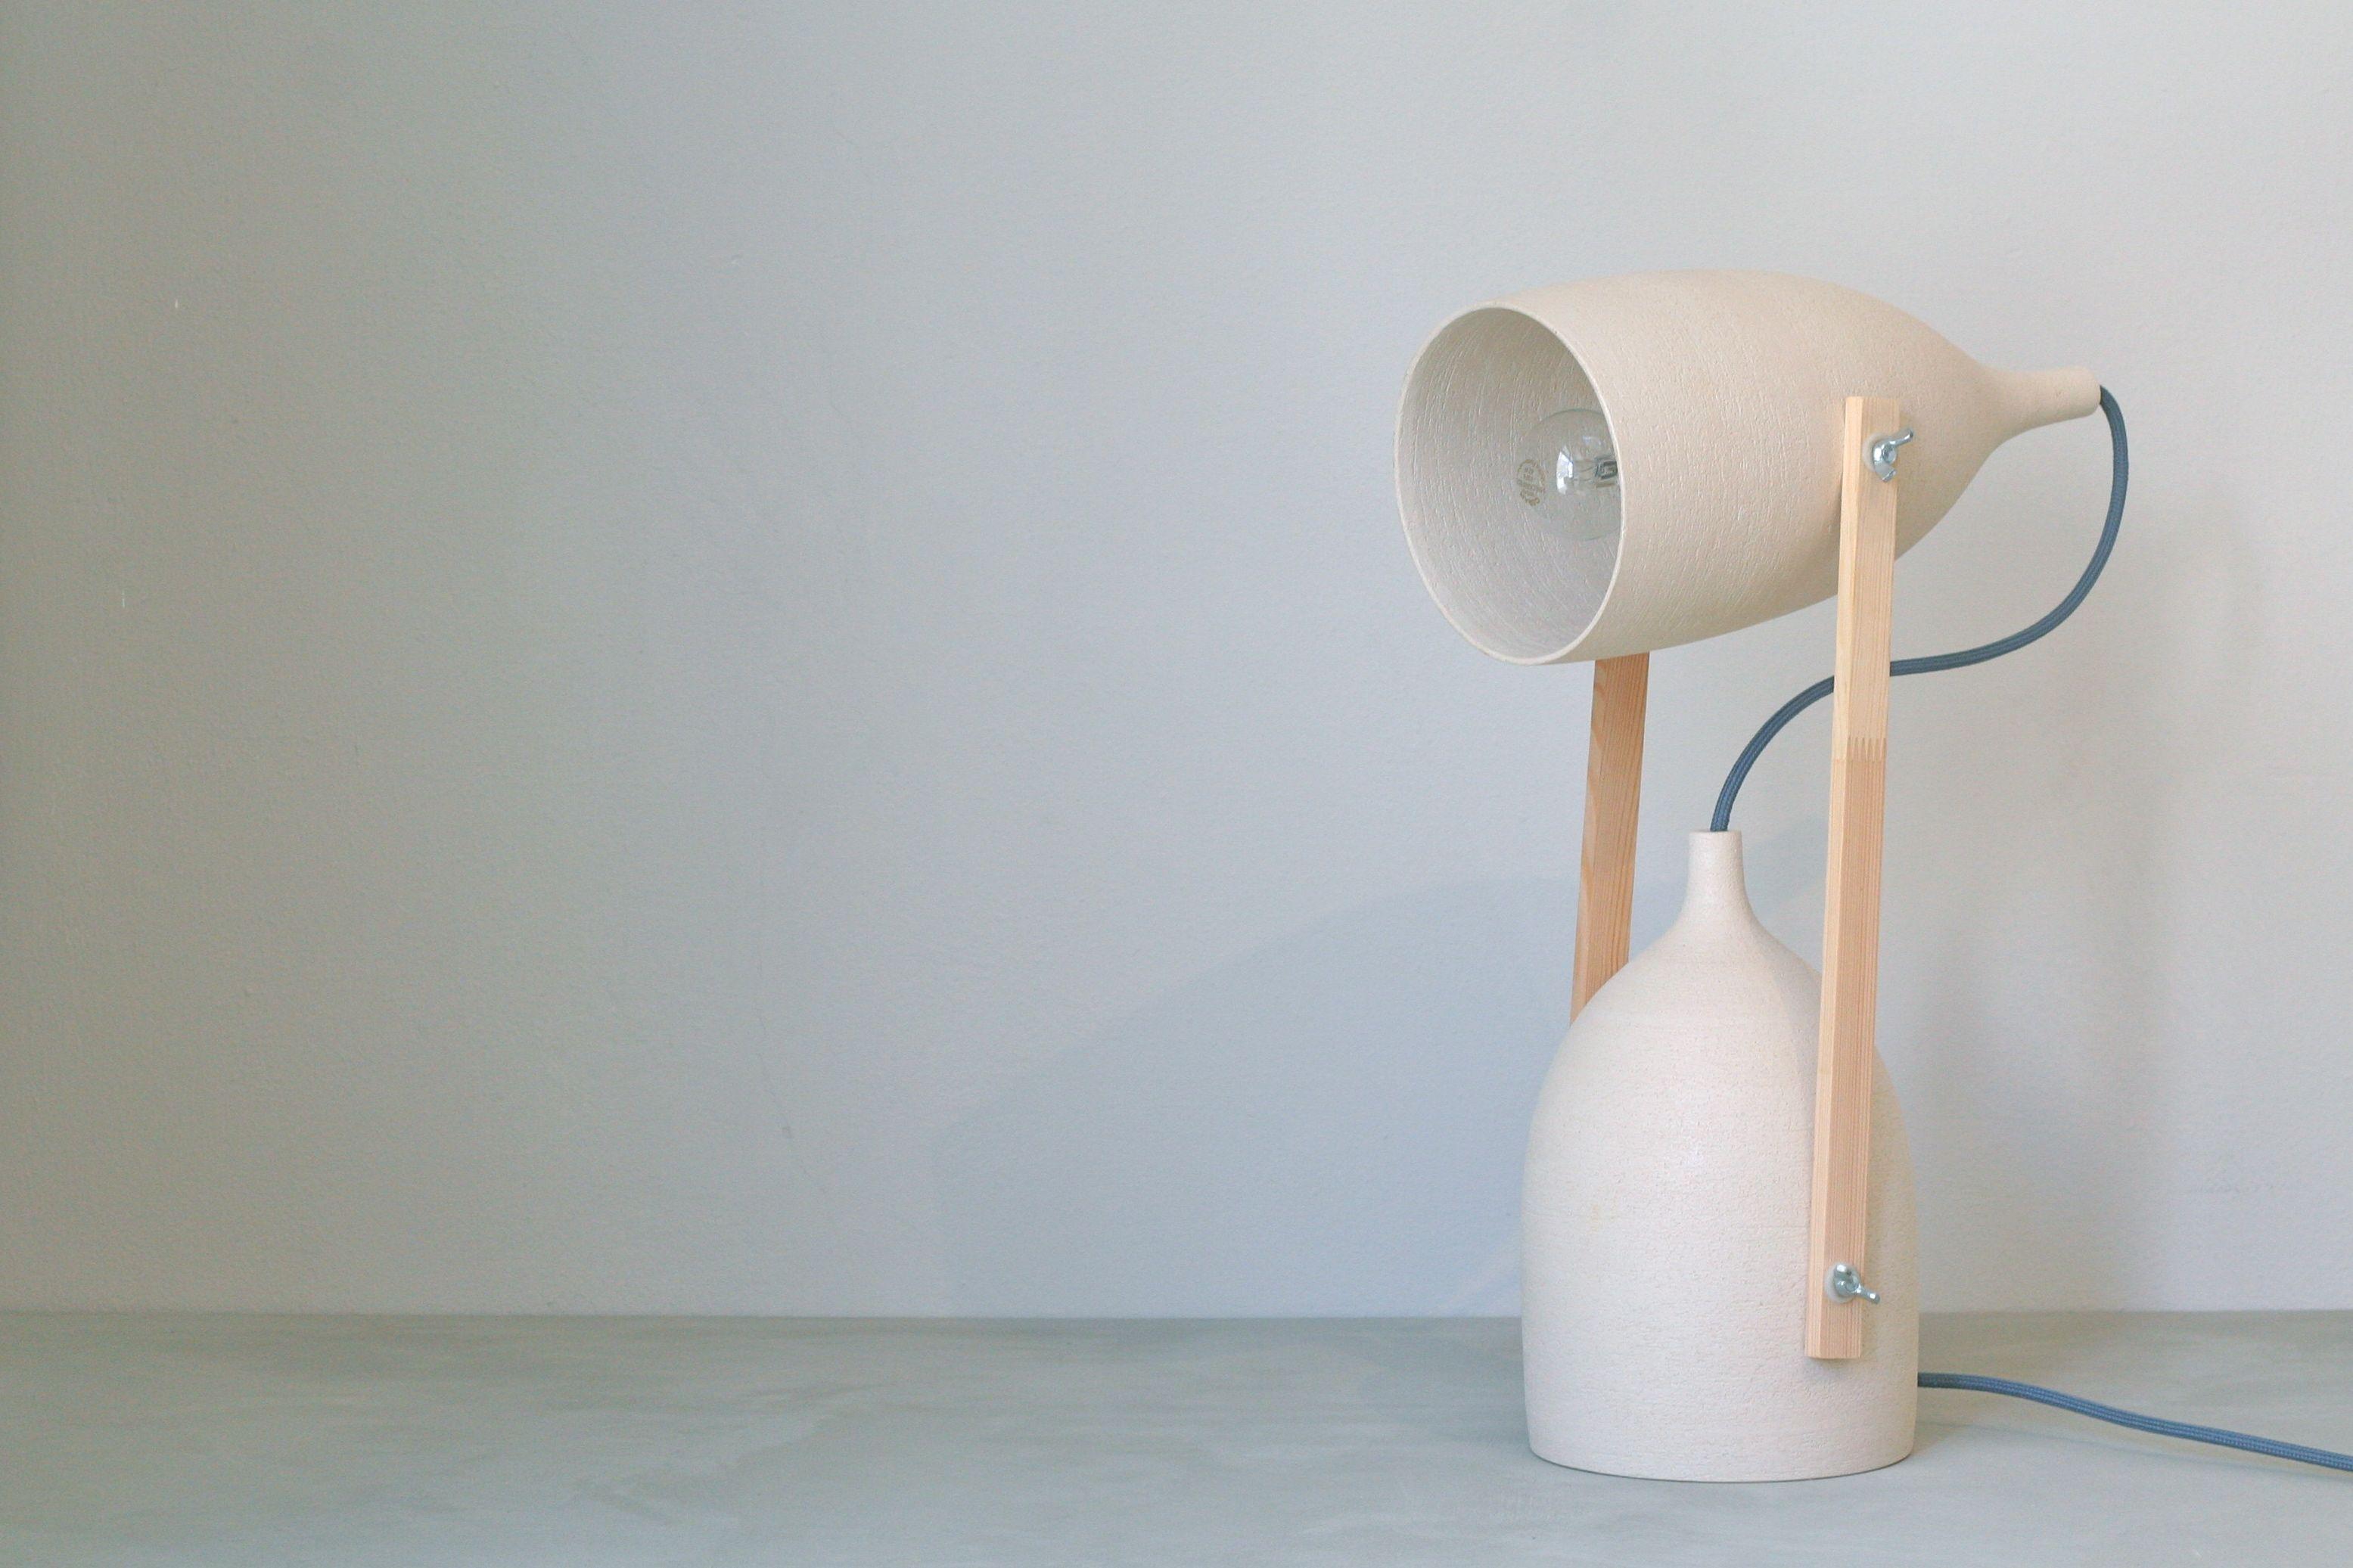 Nordic Lamp By Federica Bubani Table Lamps Uk Lamp Nordic Lights